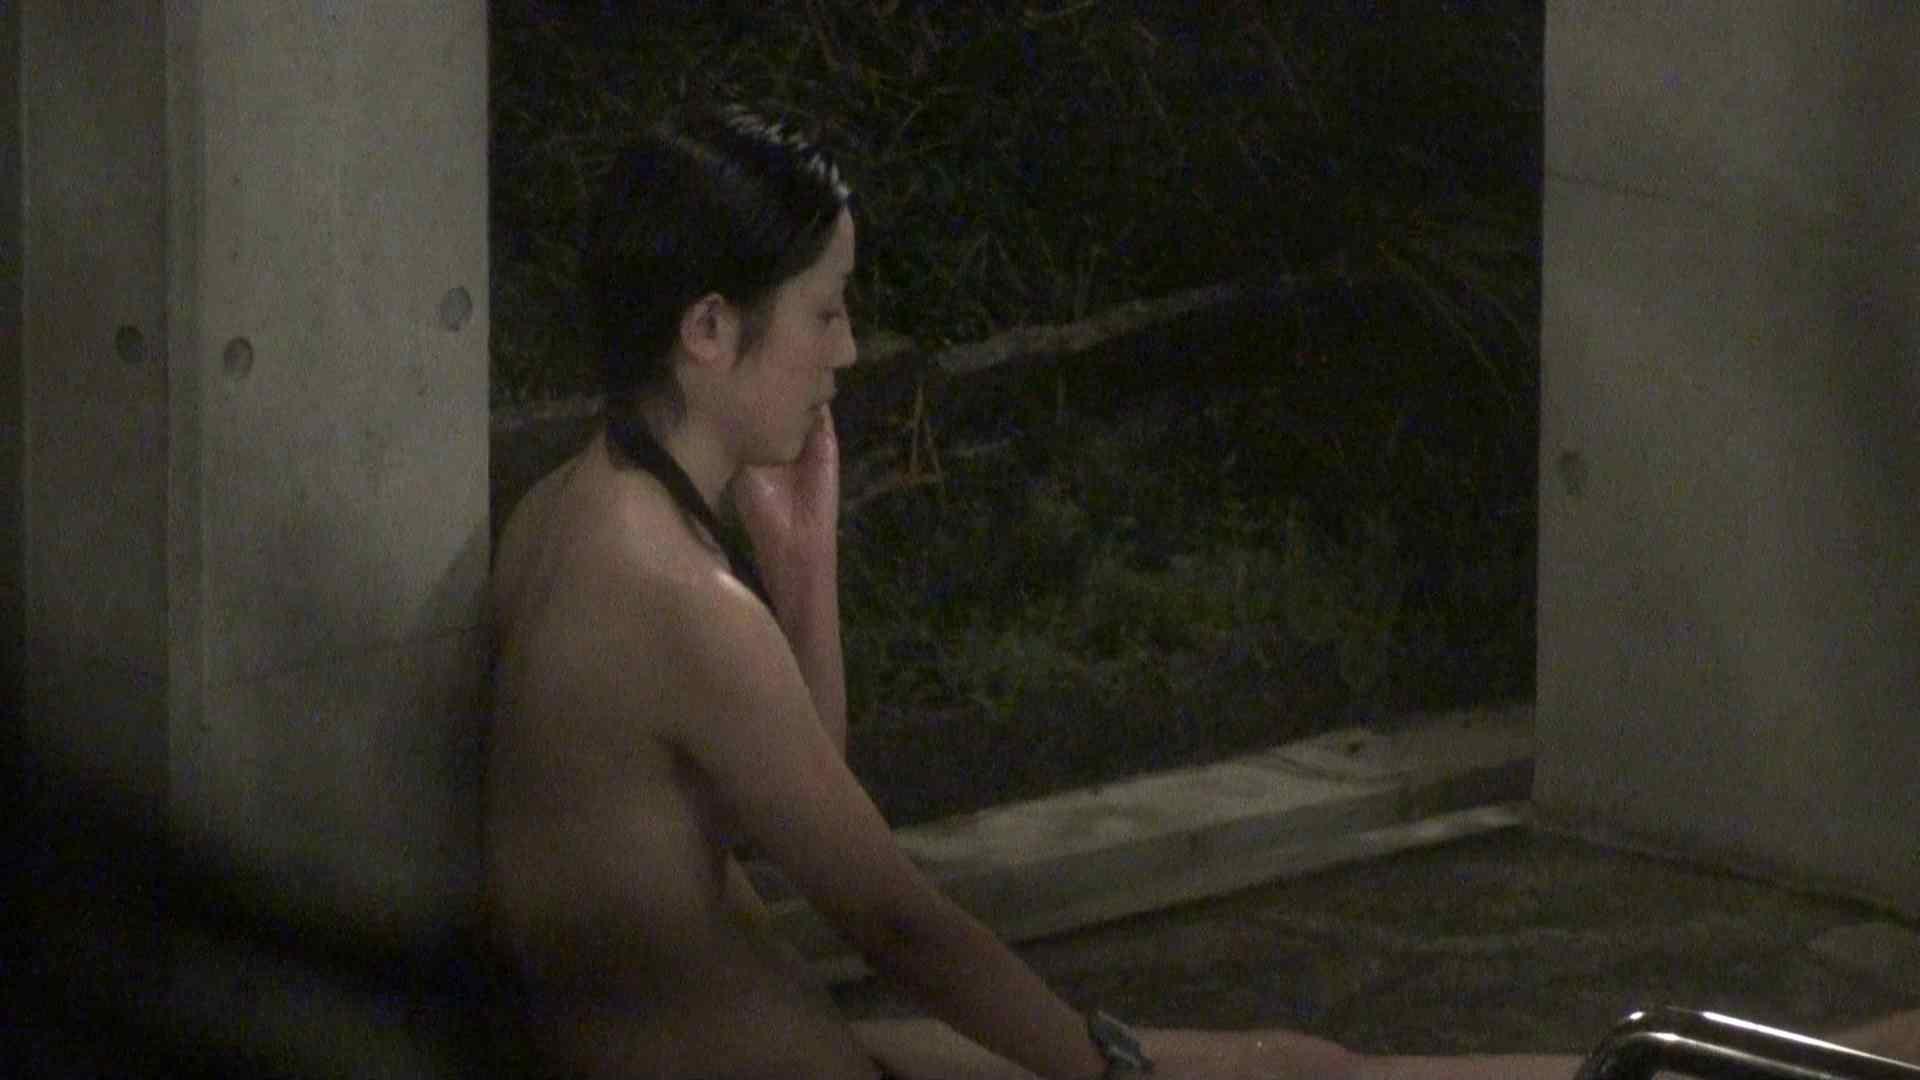 Aquaな露天風呂Vol.344 盗撮映像  44Pix 43